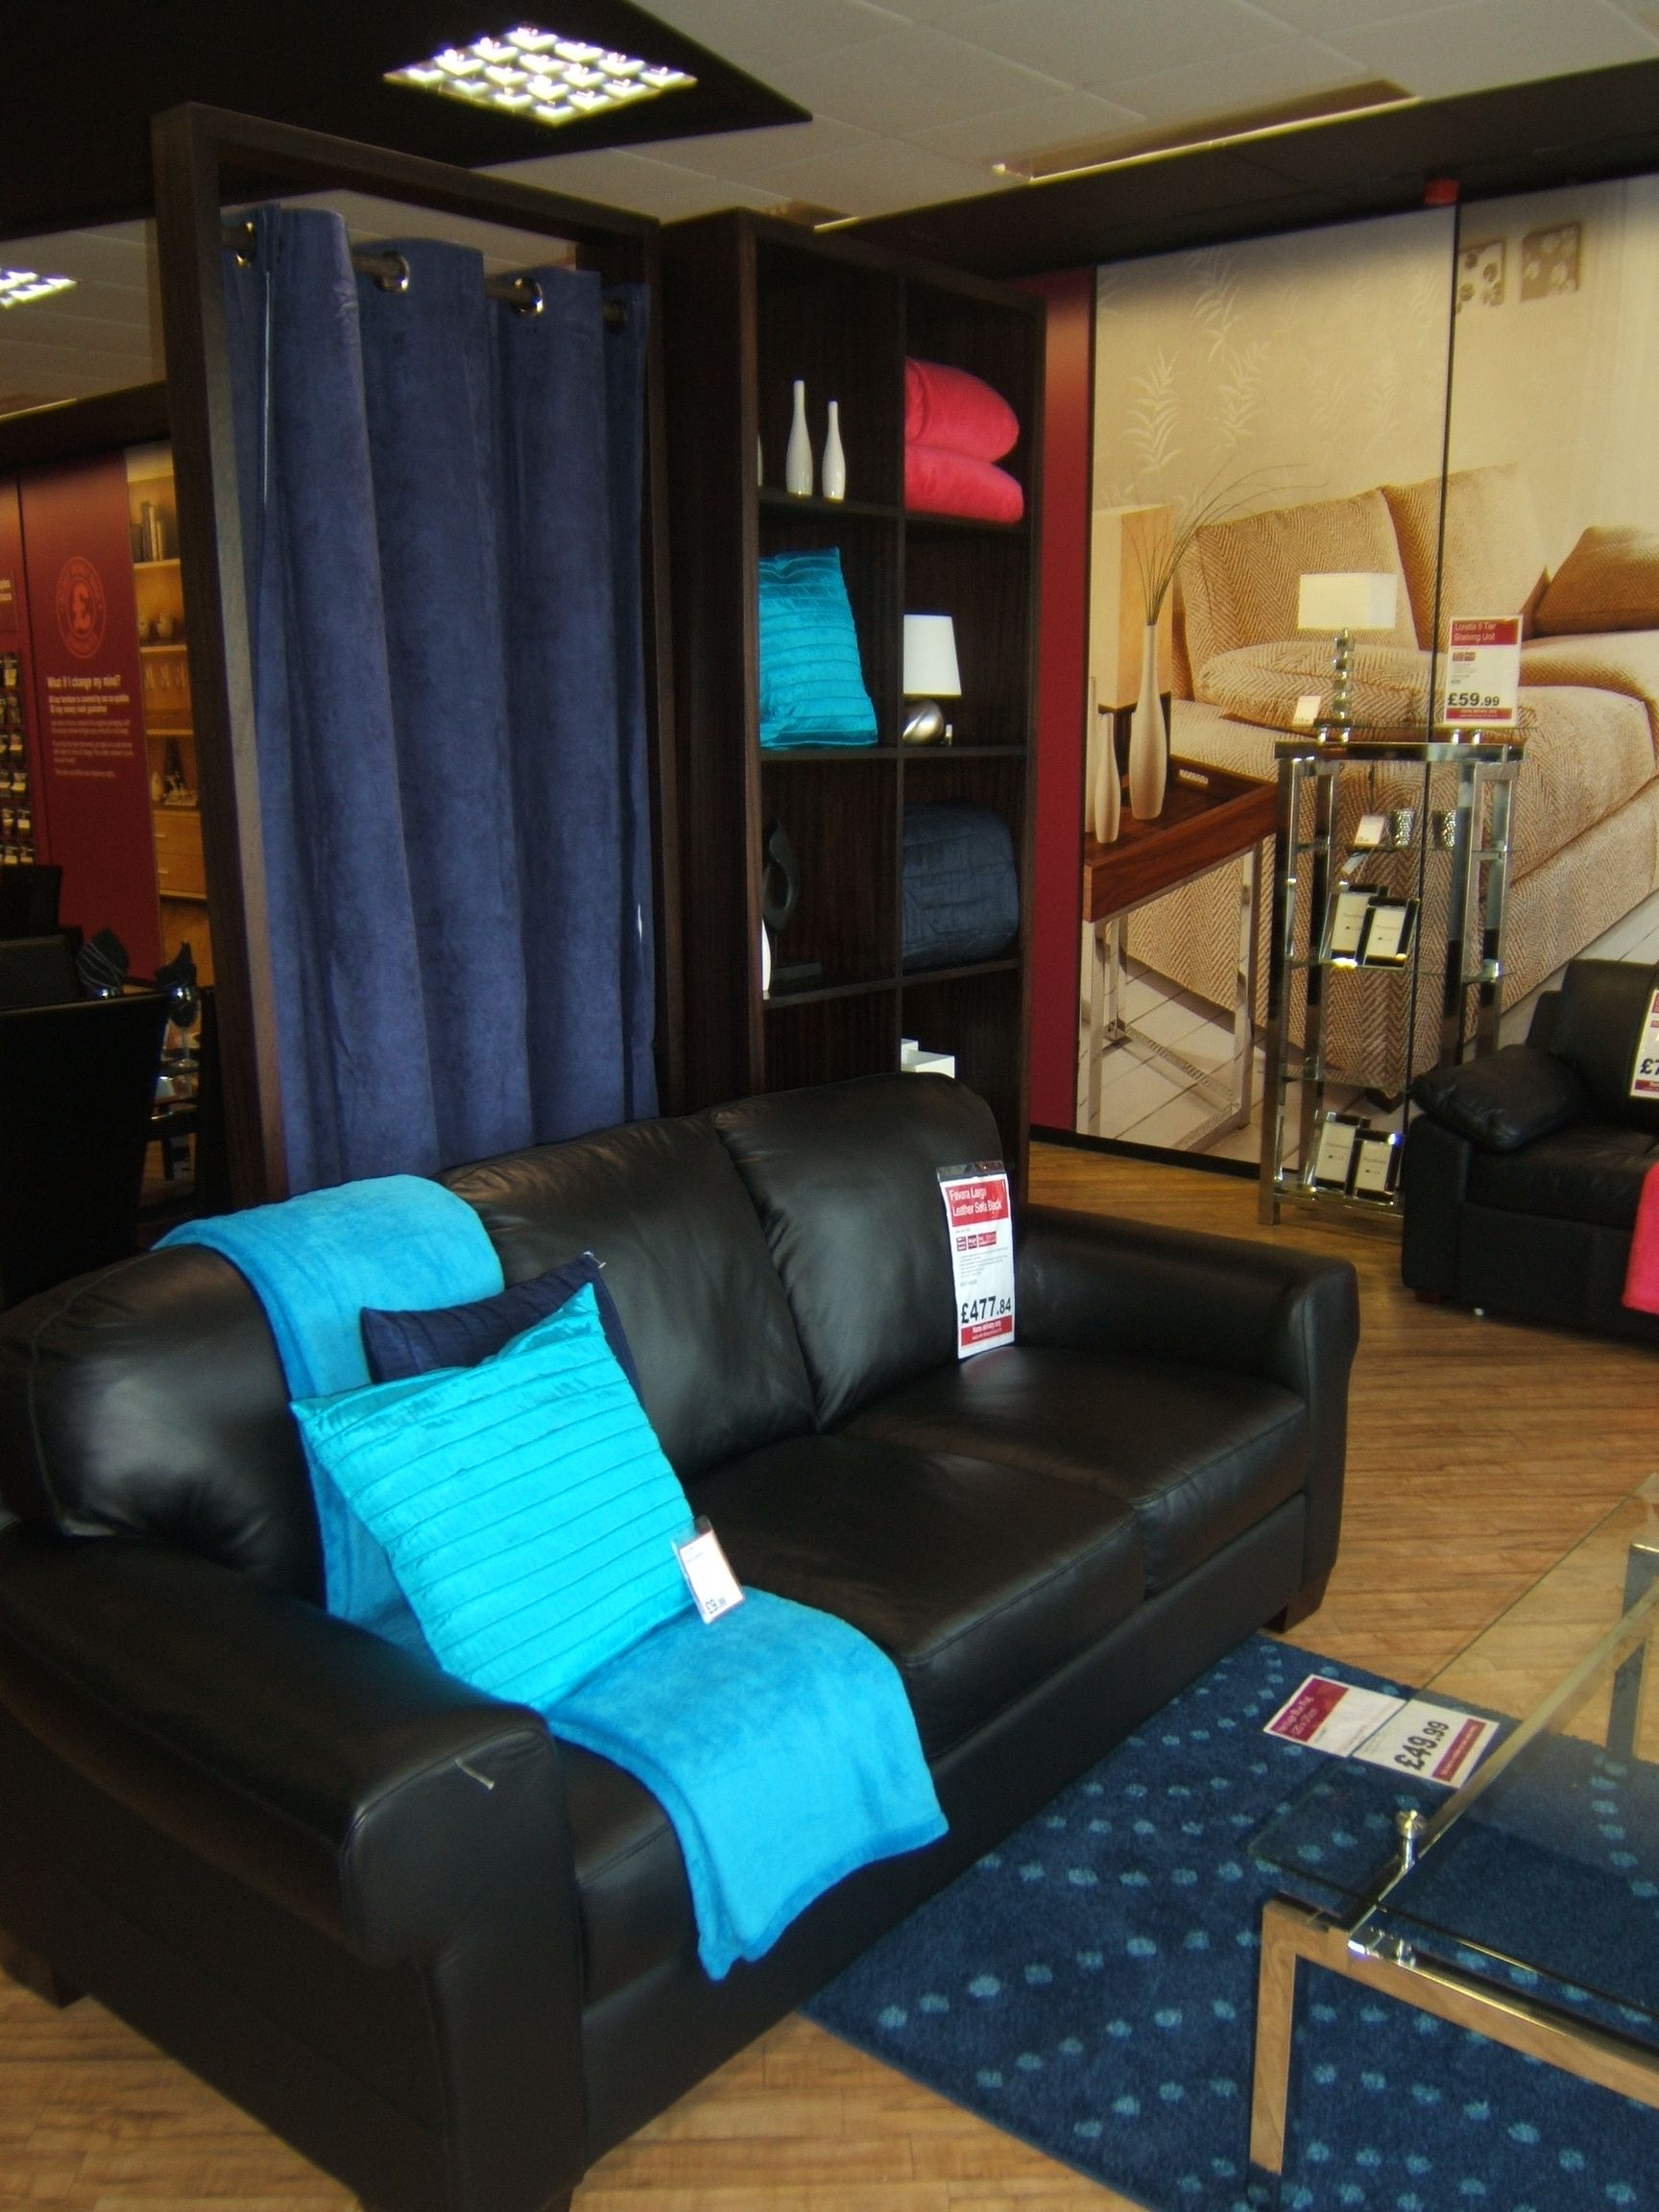 Argos   Furniture   Visual Merchandising   Landscape   Customer Journey   Focal  Point   Room